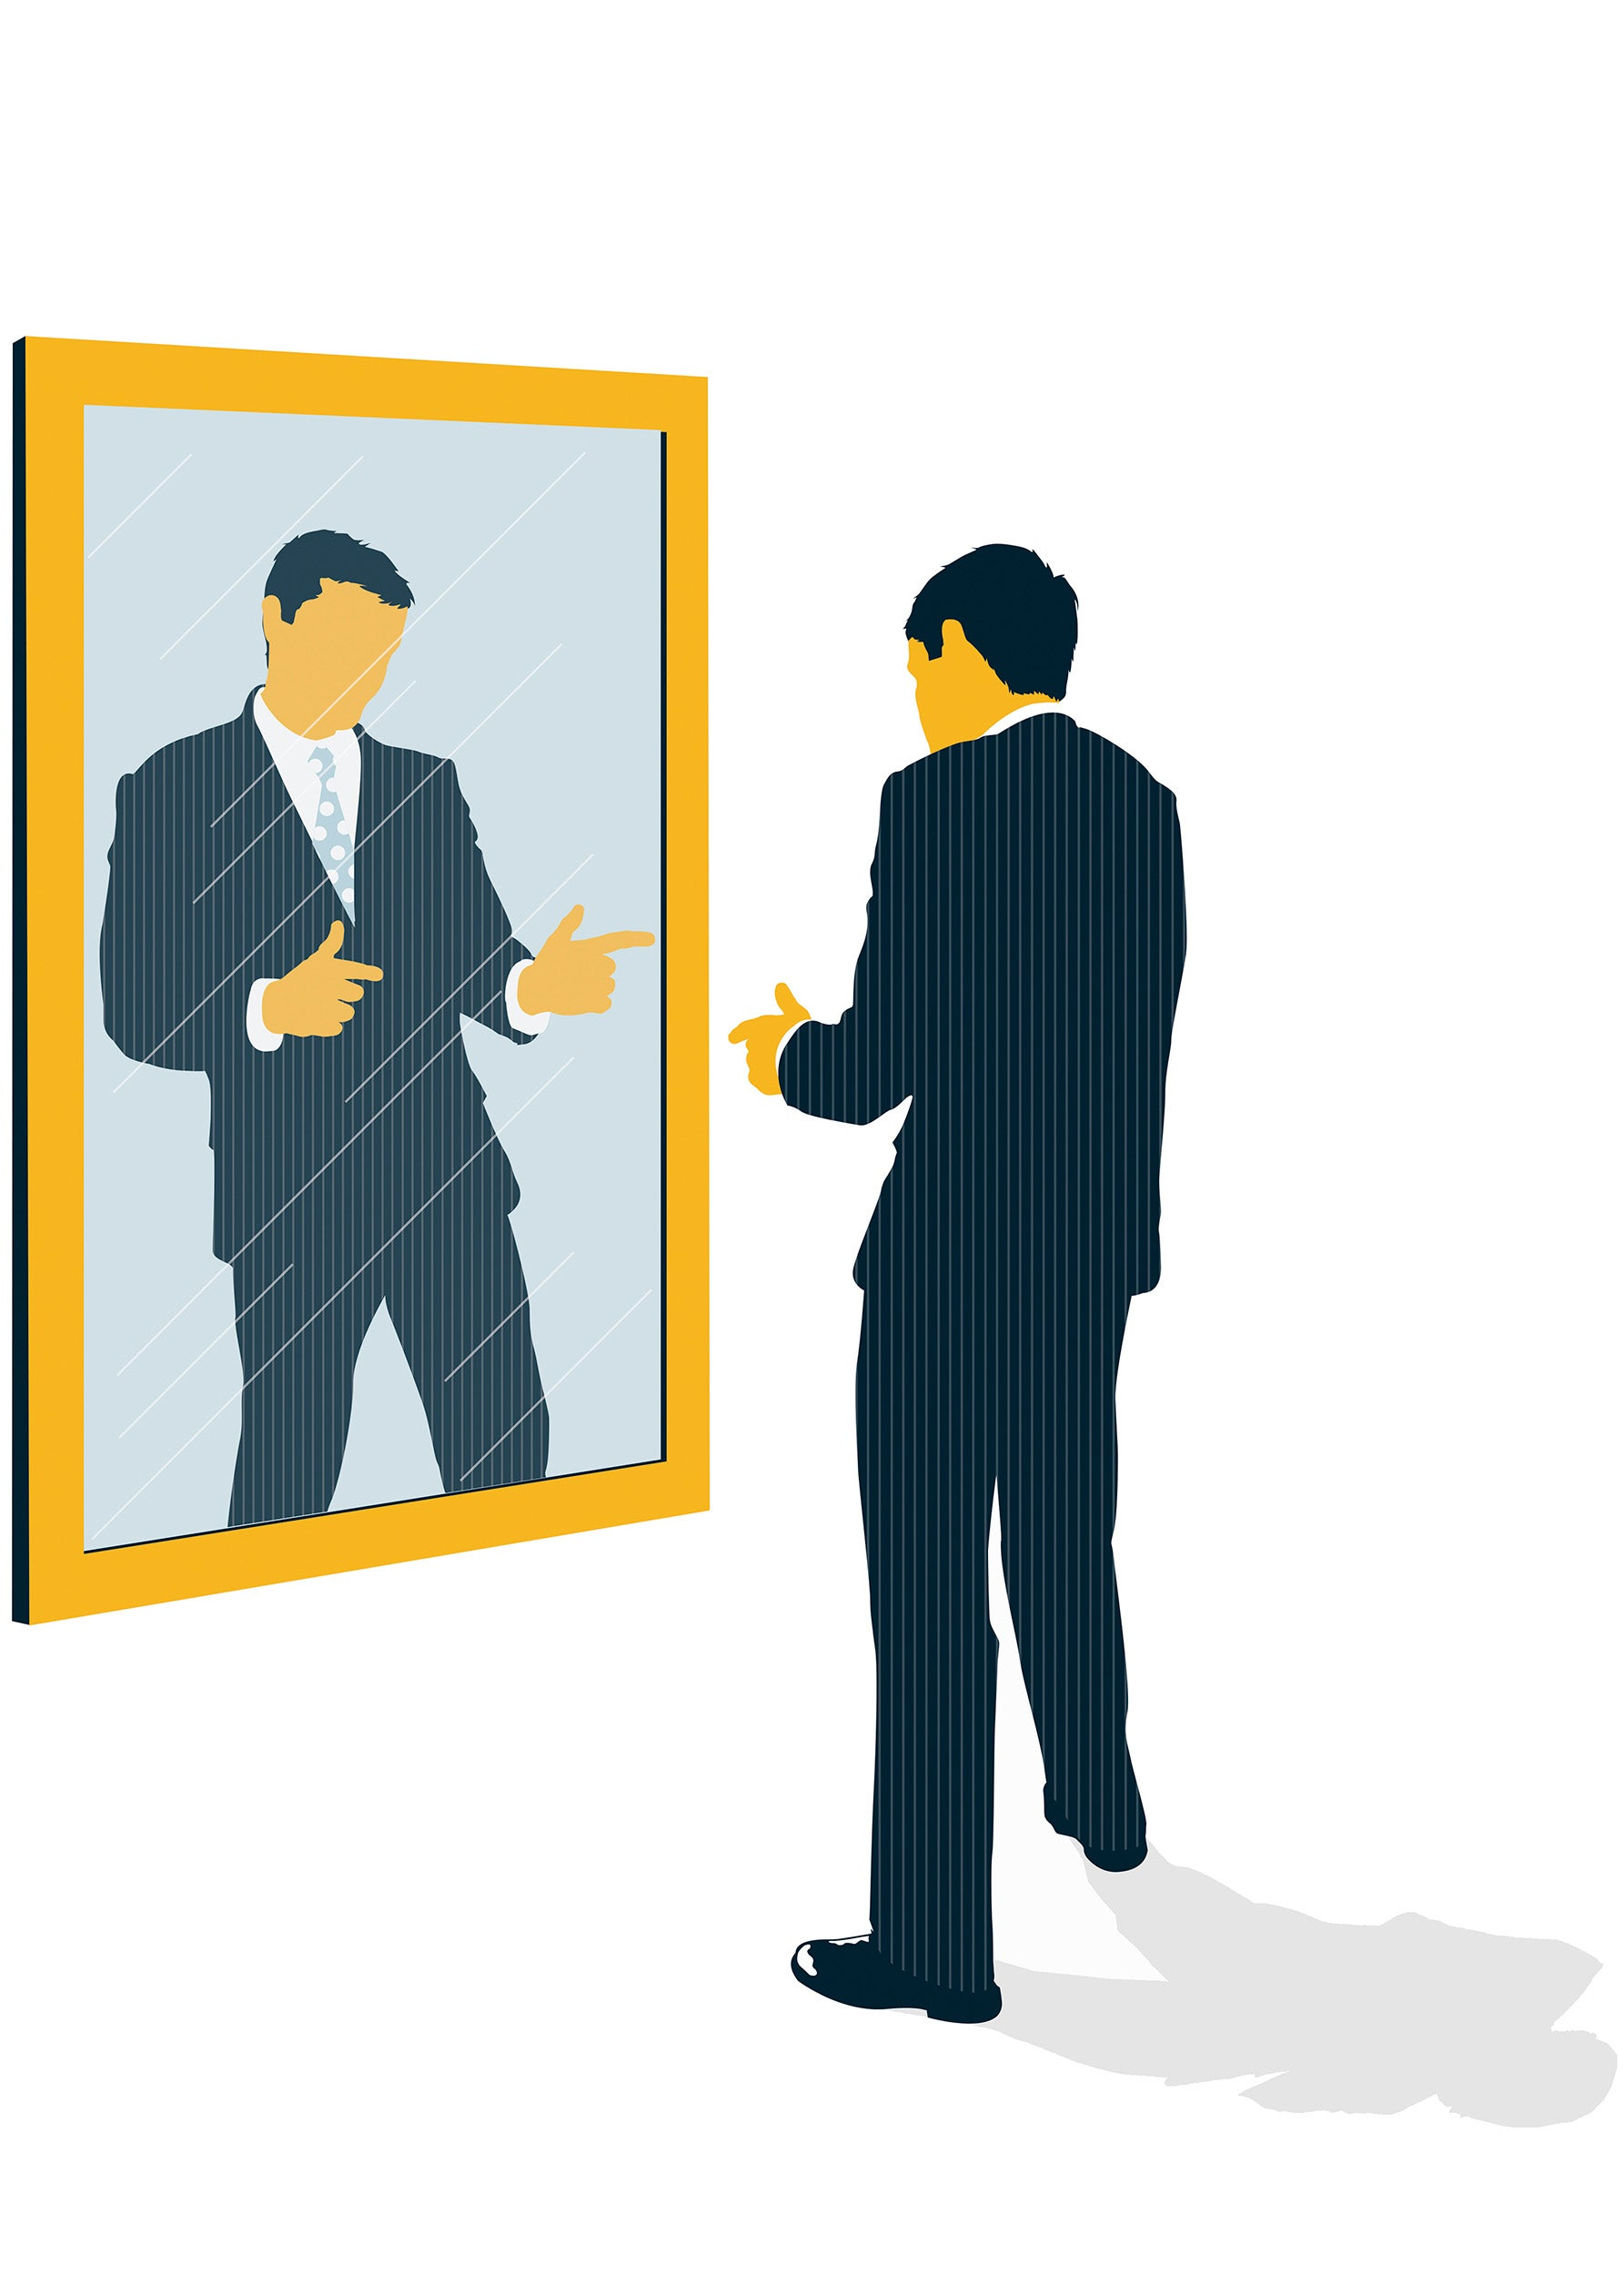 Illustration of confident man facing mirror.